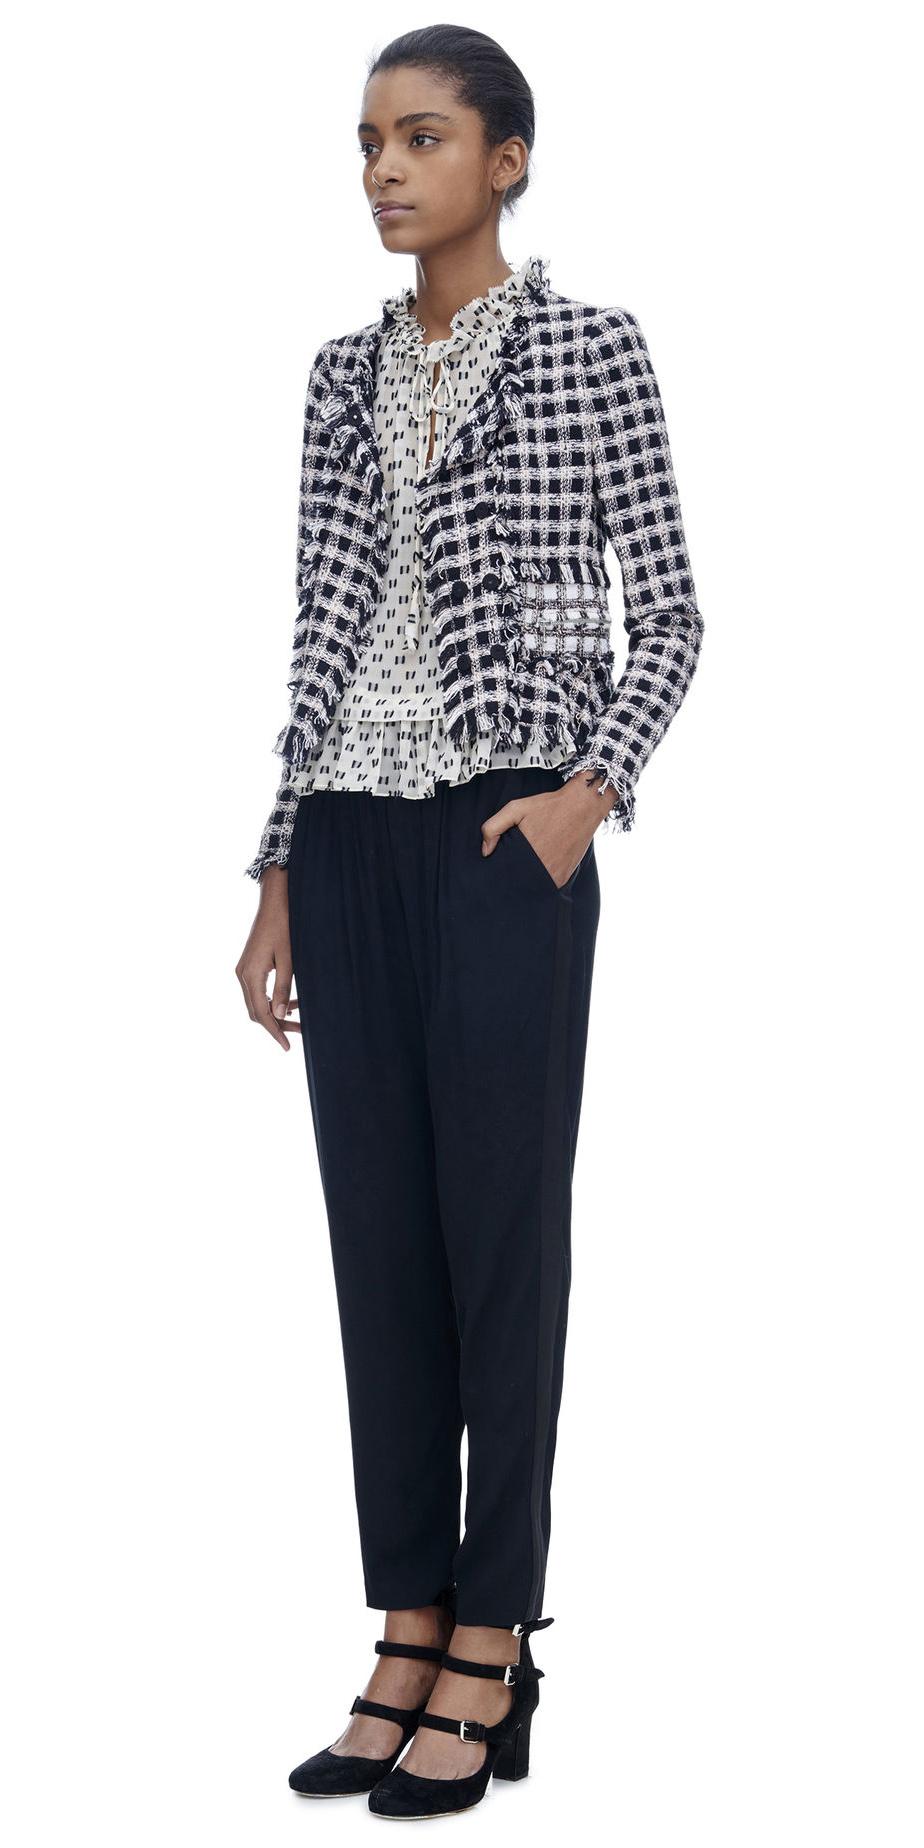 white-top-blouse-print-brun-black-shoe-pumps-black-jacket-lady-fall-winter-lunch.jpg